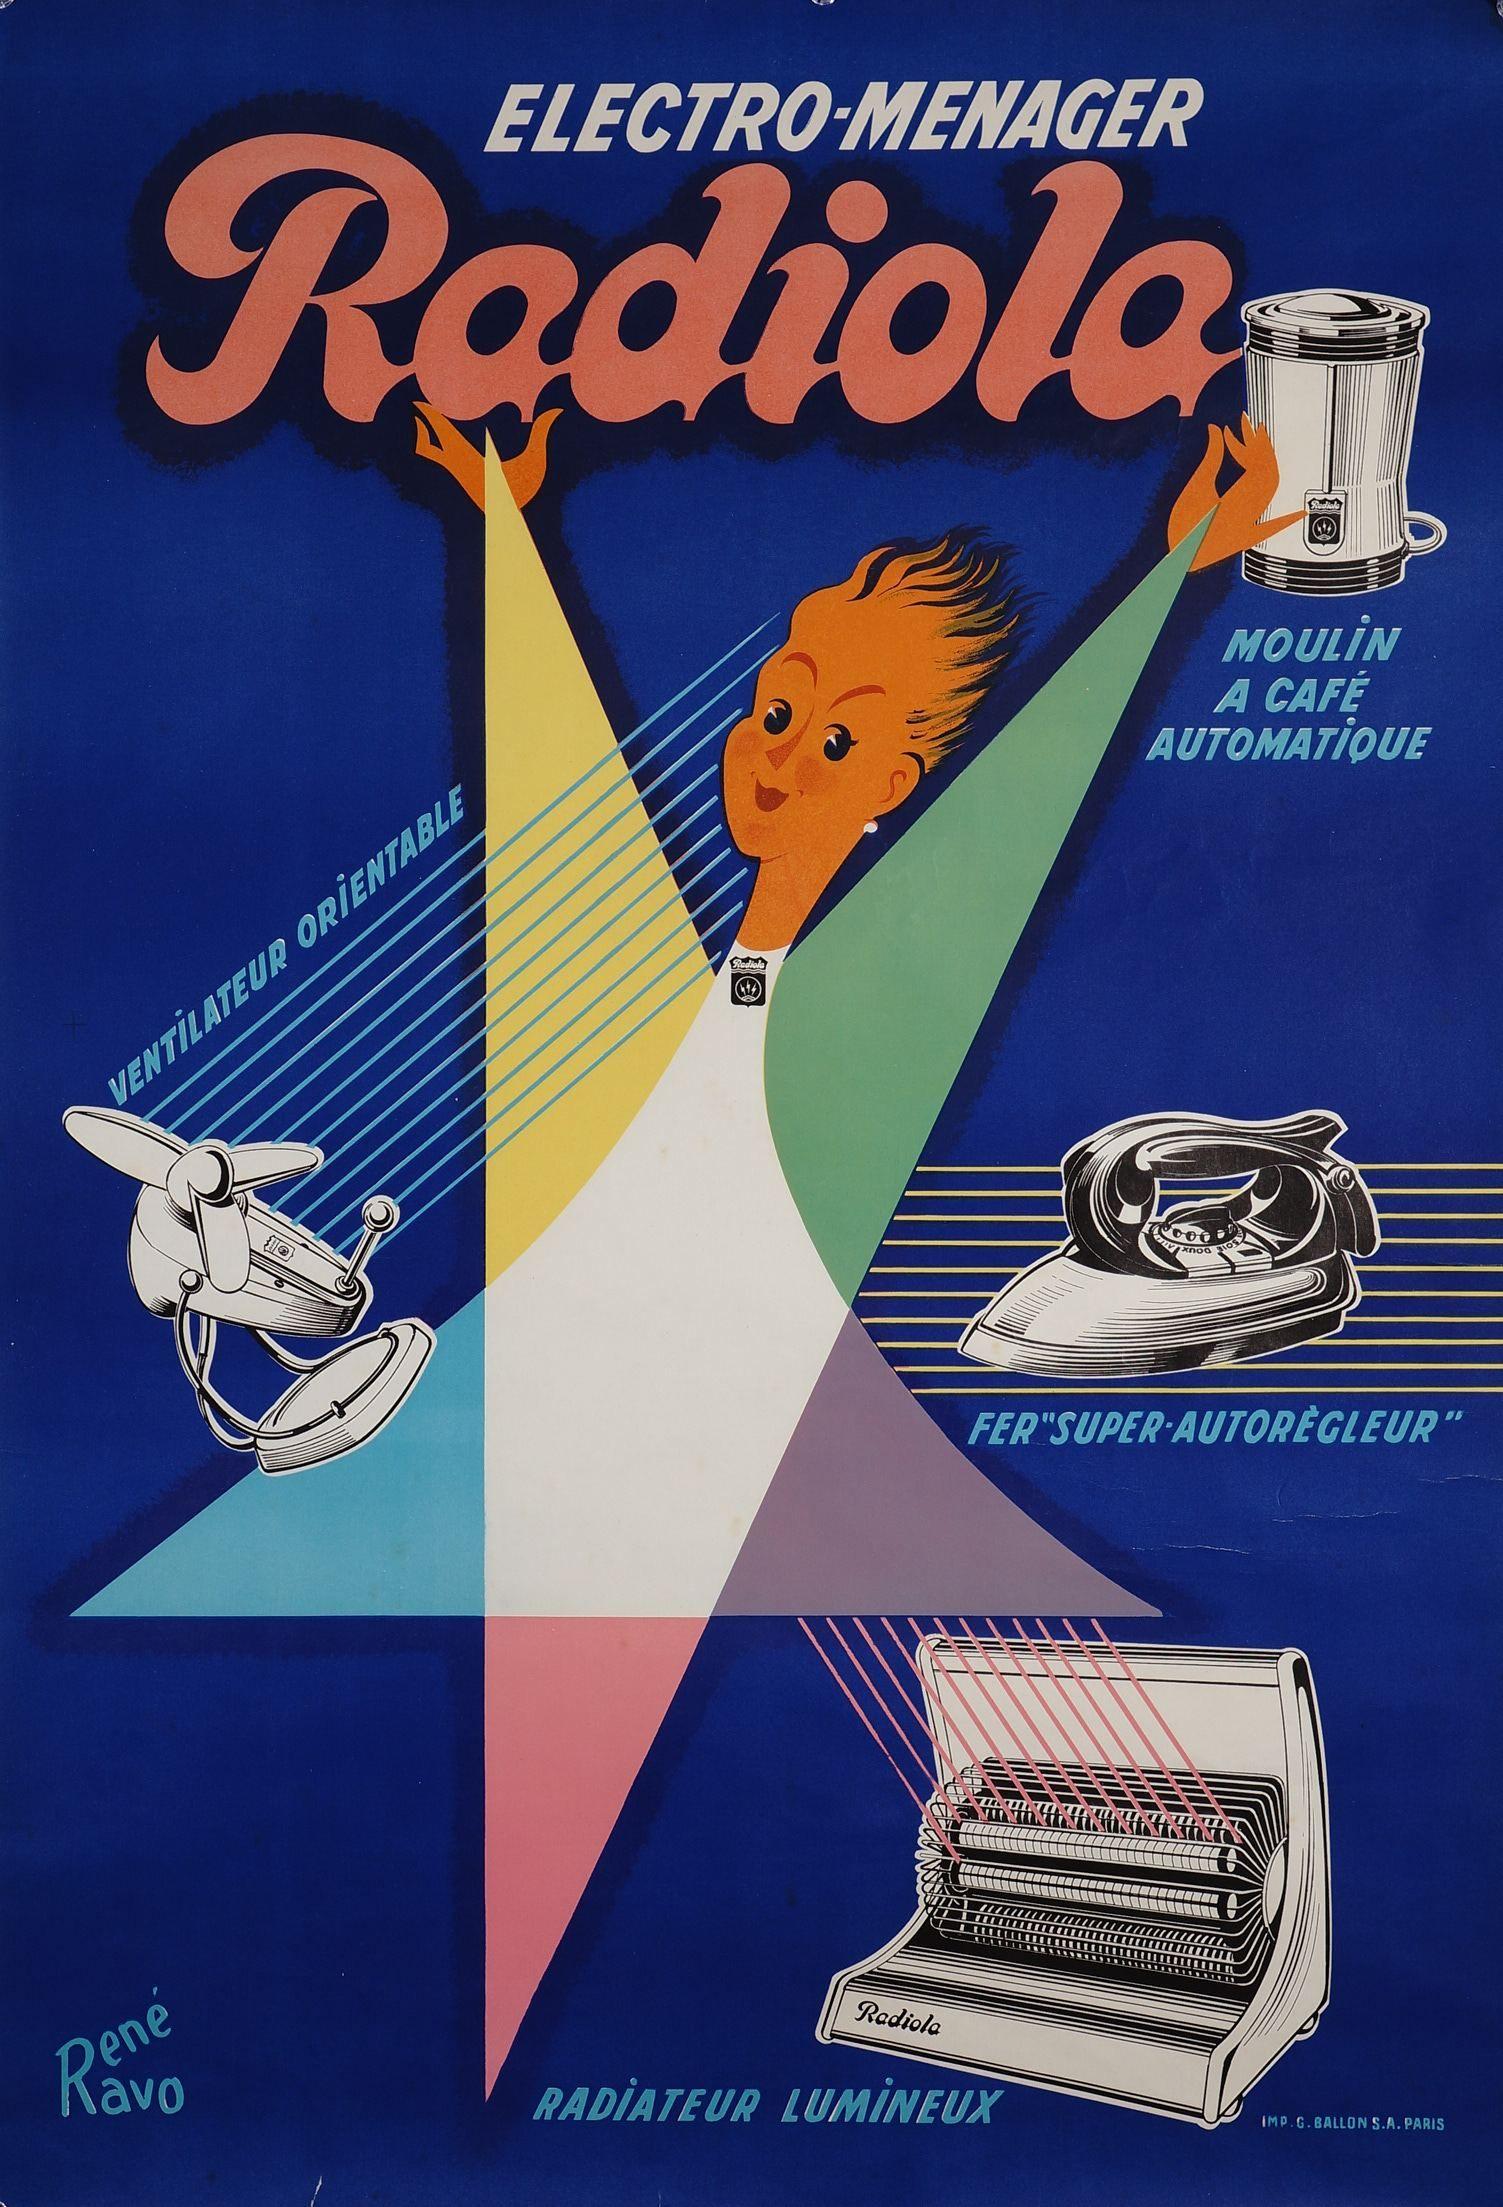 Radiola (1950s)